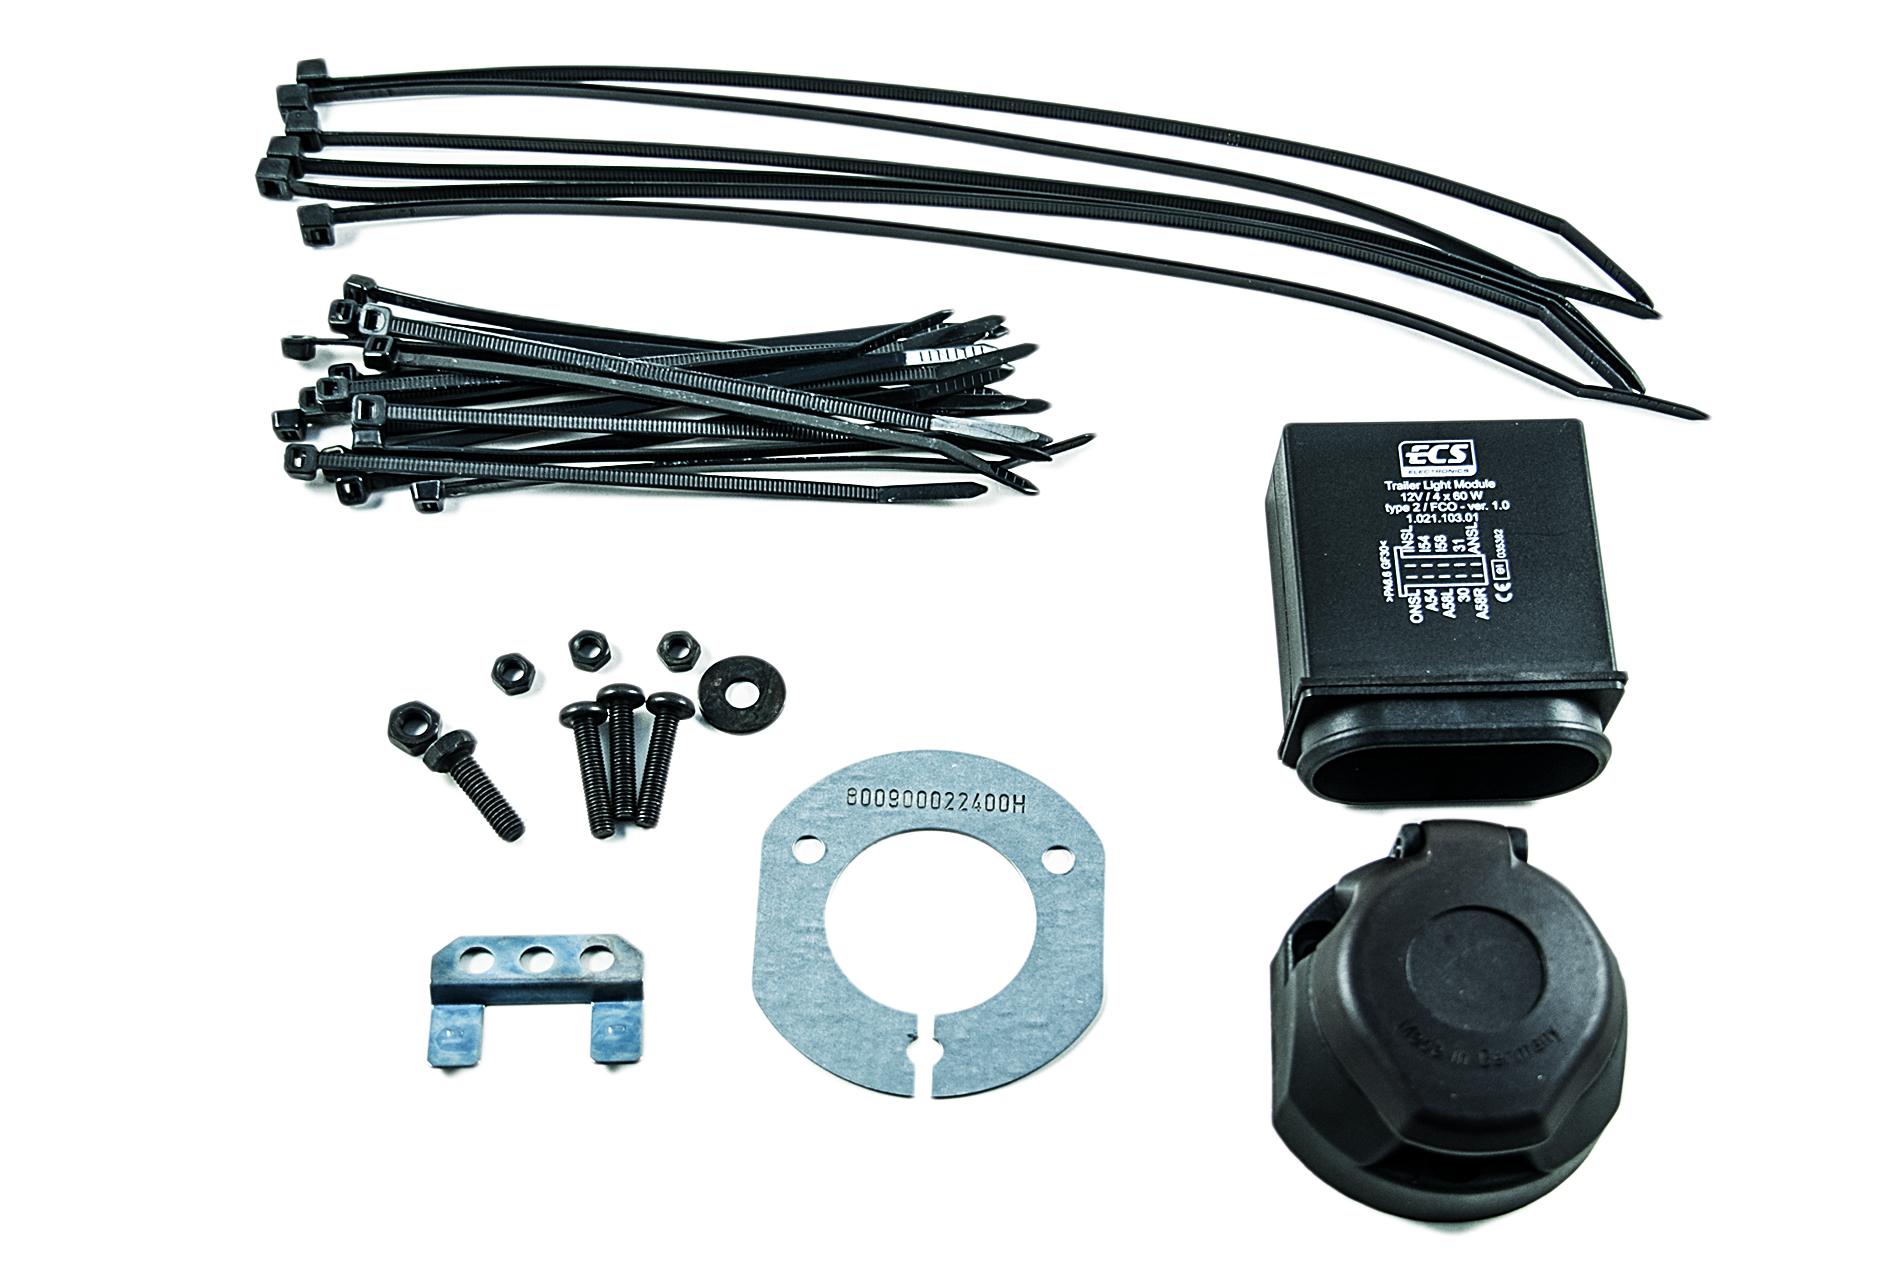 hight resolution of nissan genuine navara electrical kit wiring for towbar hitch 13pin ke505ebn13ab ebay